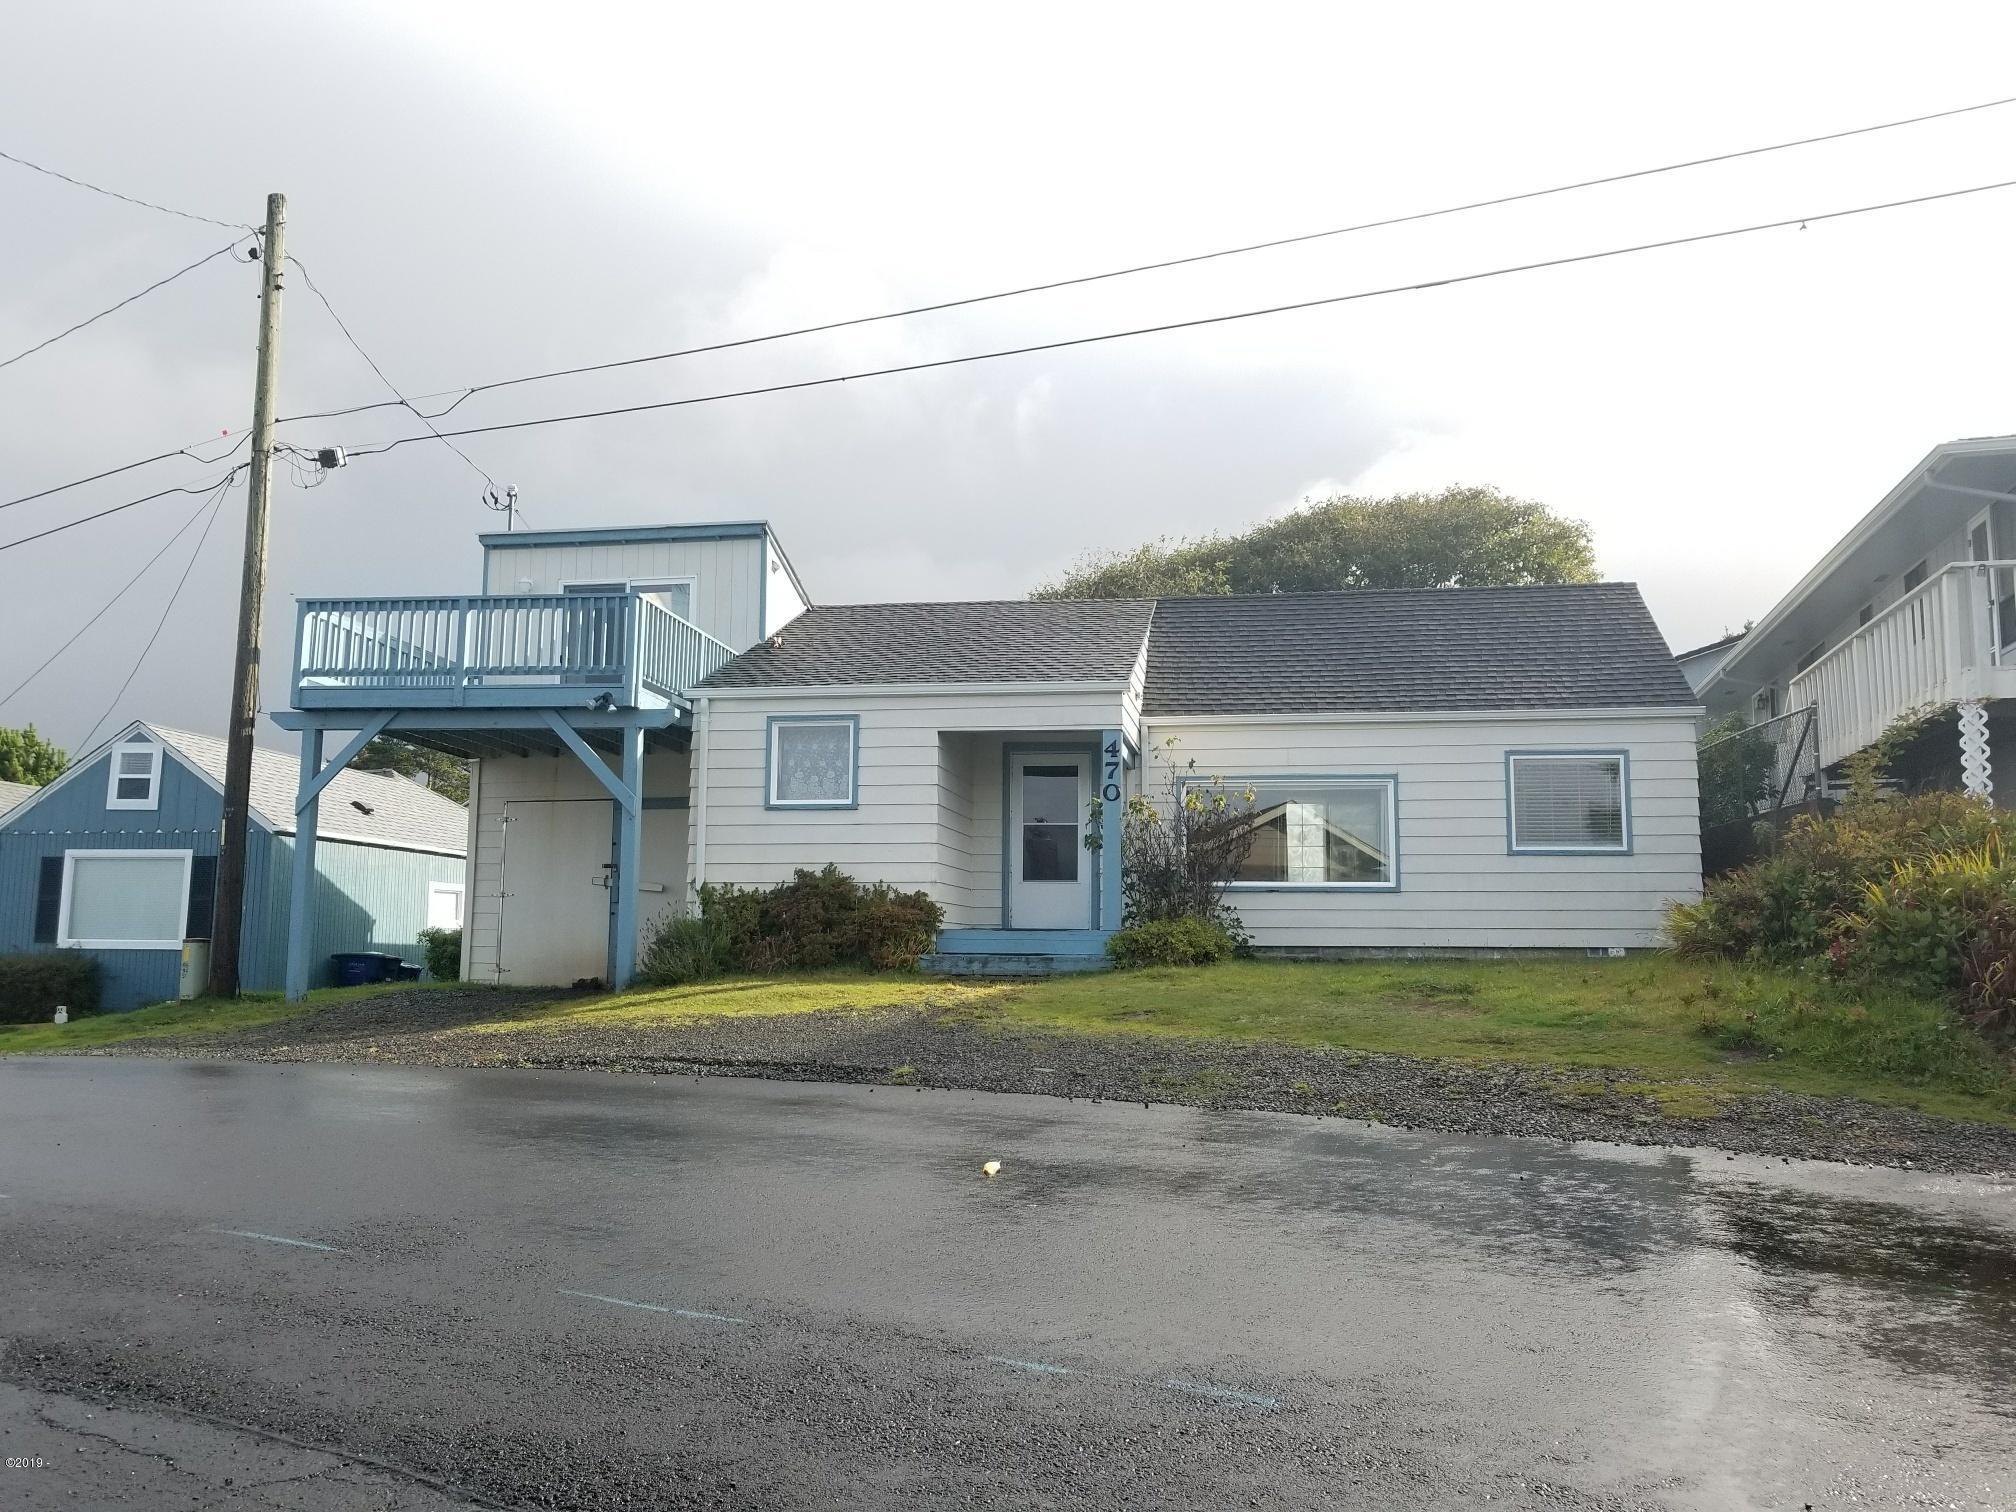 470 SW Coast Ave, Depoe Bay, OR 97341 - 470 Coast